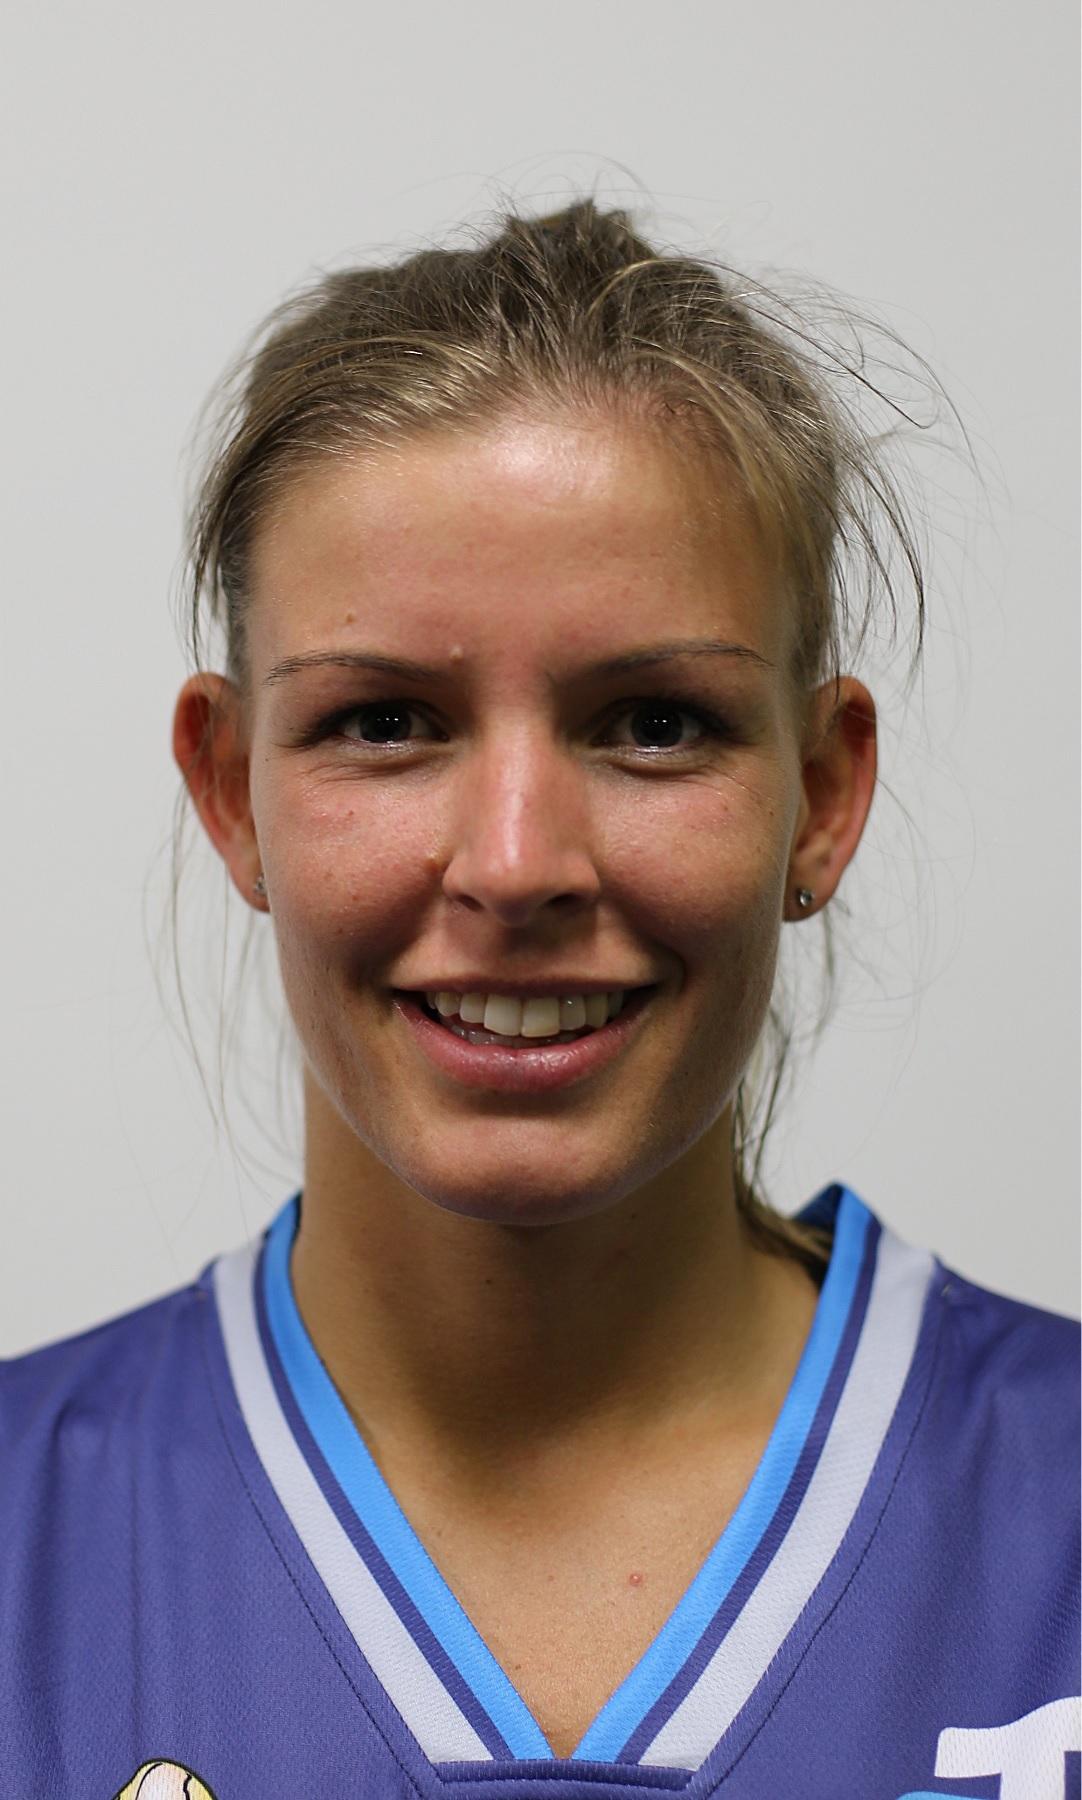 Isabelle Morgan